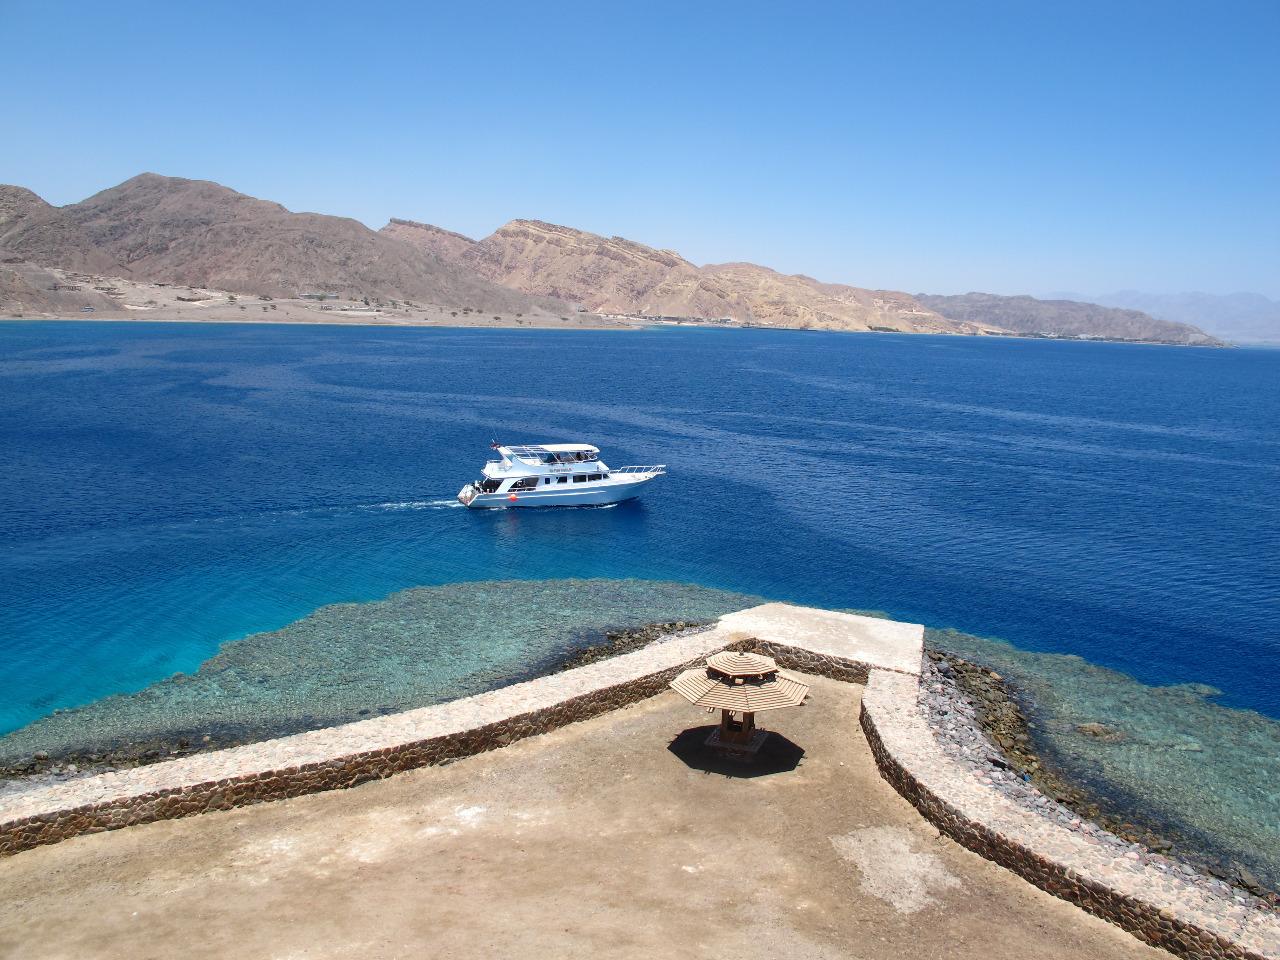 Aqua Sport Taba Boat at Coral Island